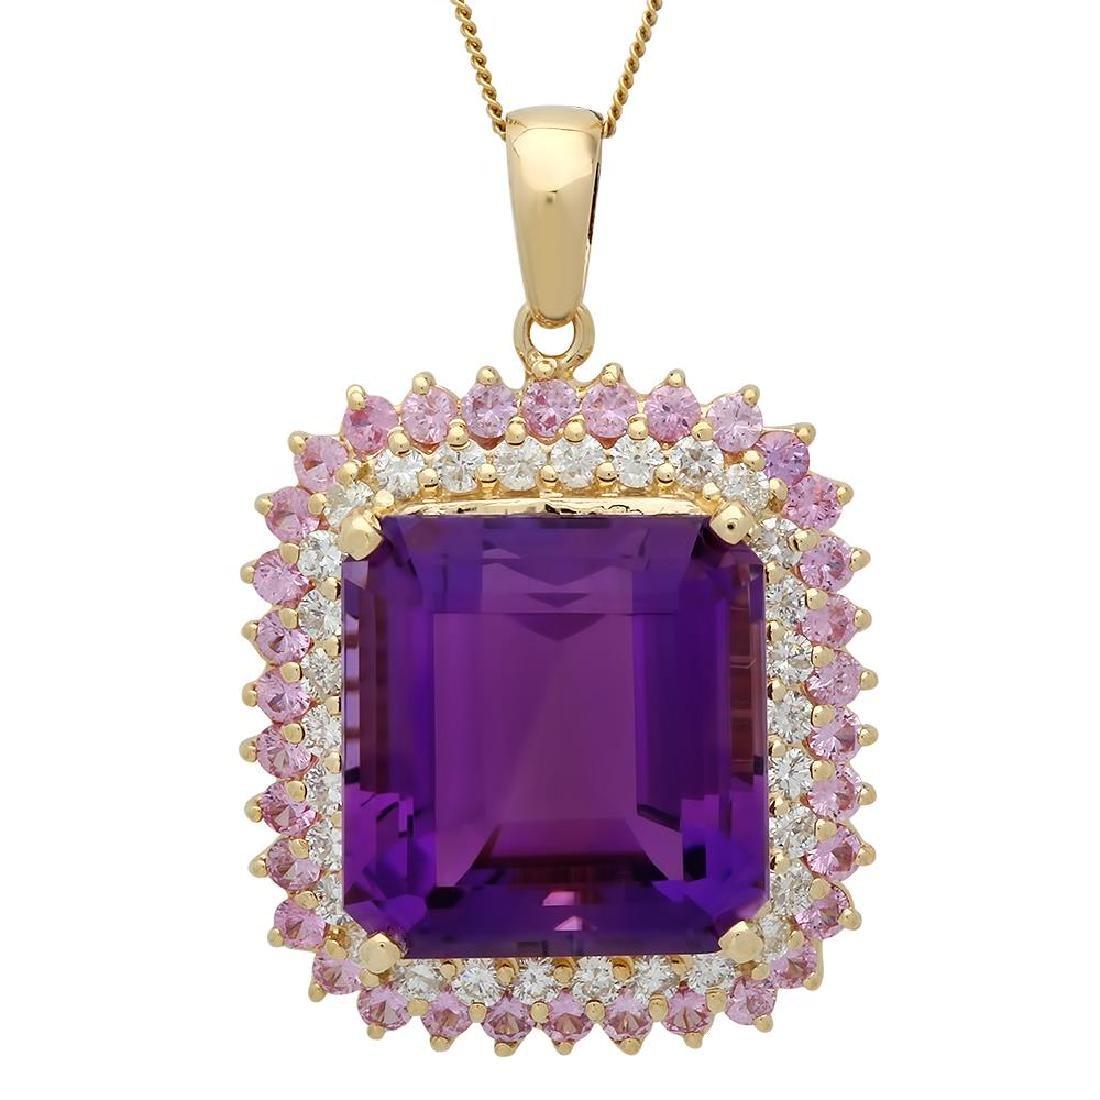 14K Gold 26.16ct Amethyst 2.05ct Sapphire 1.45ct